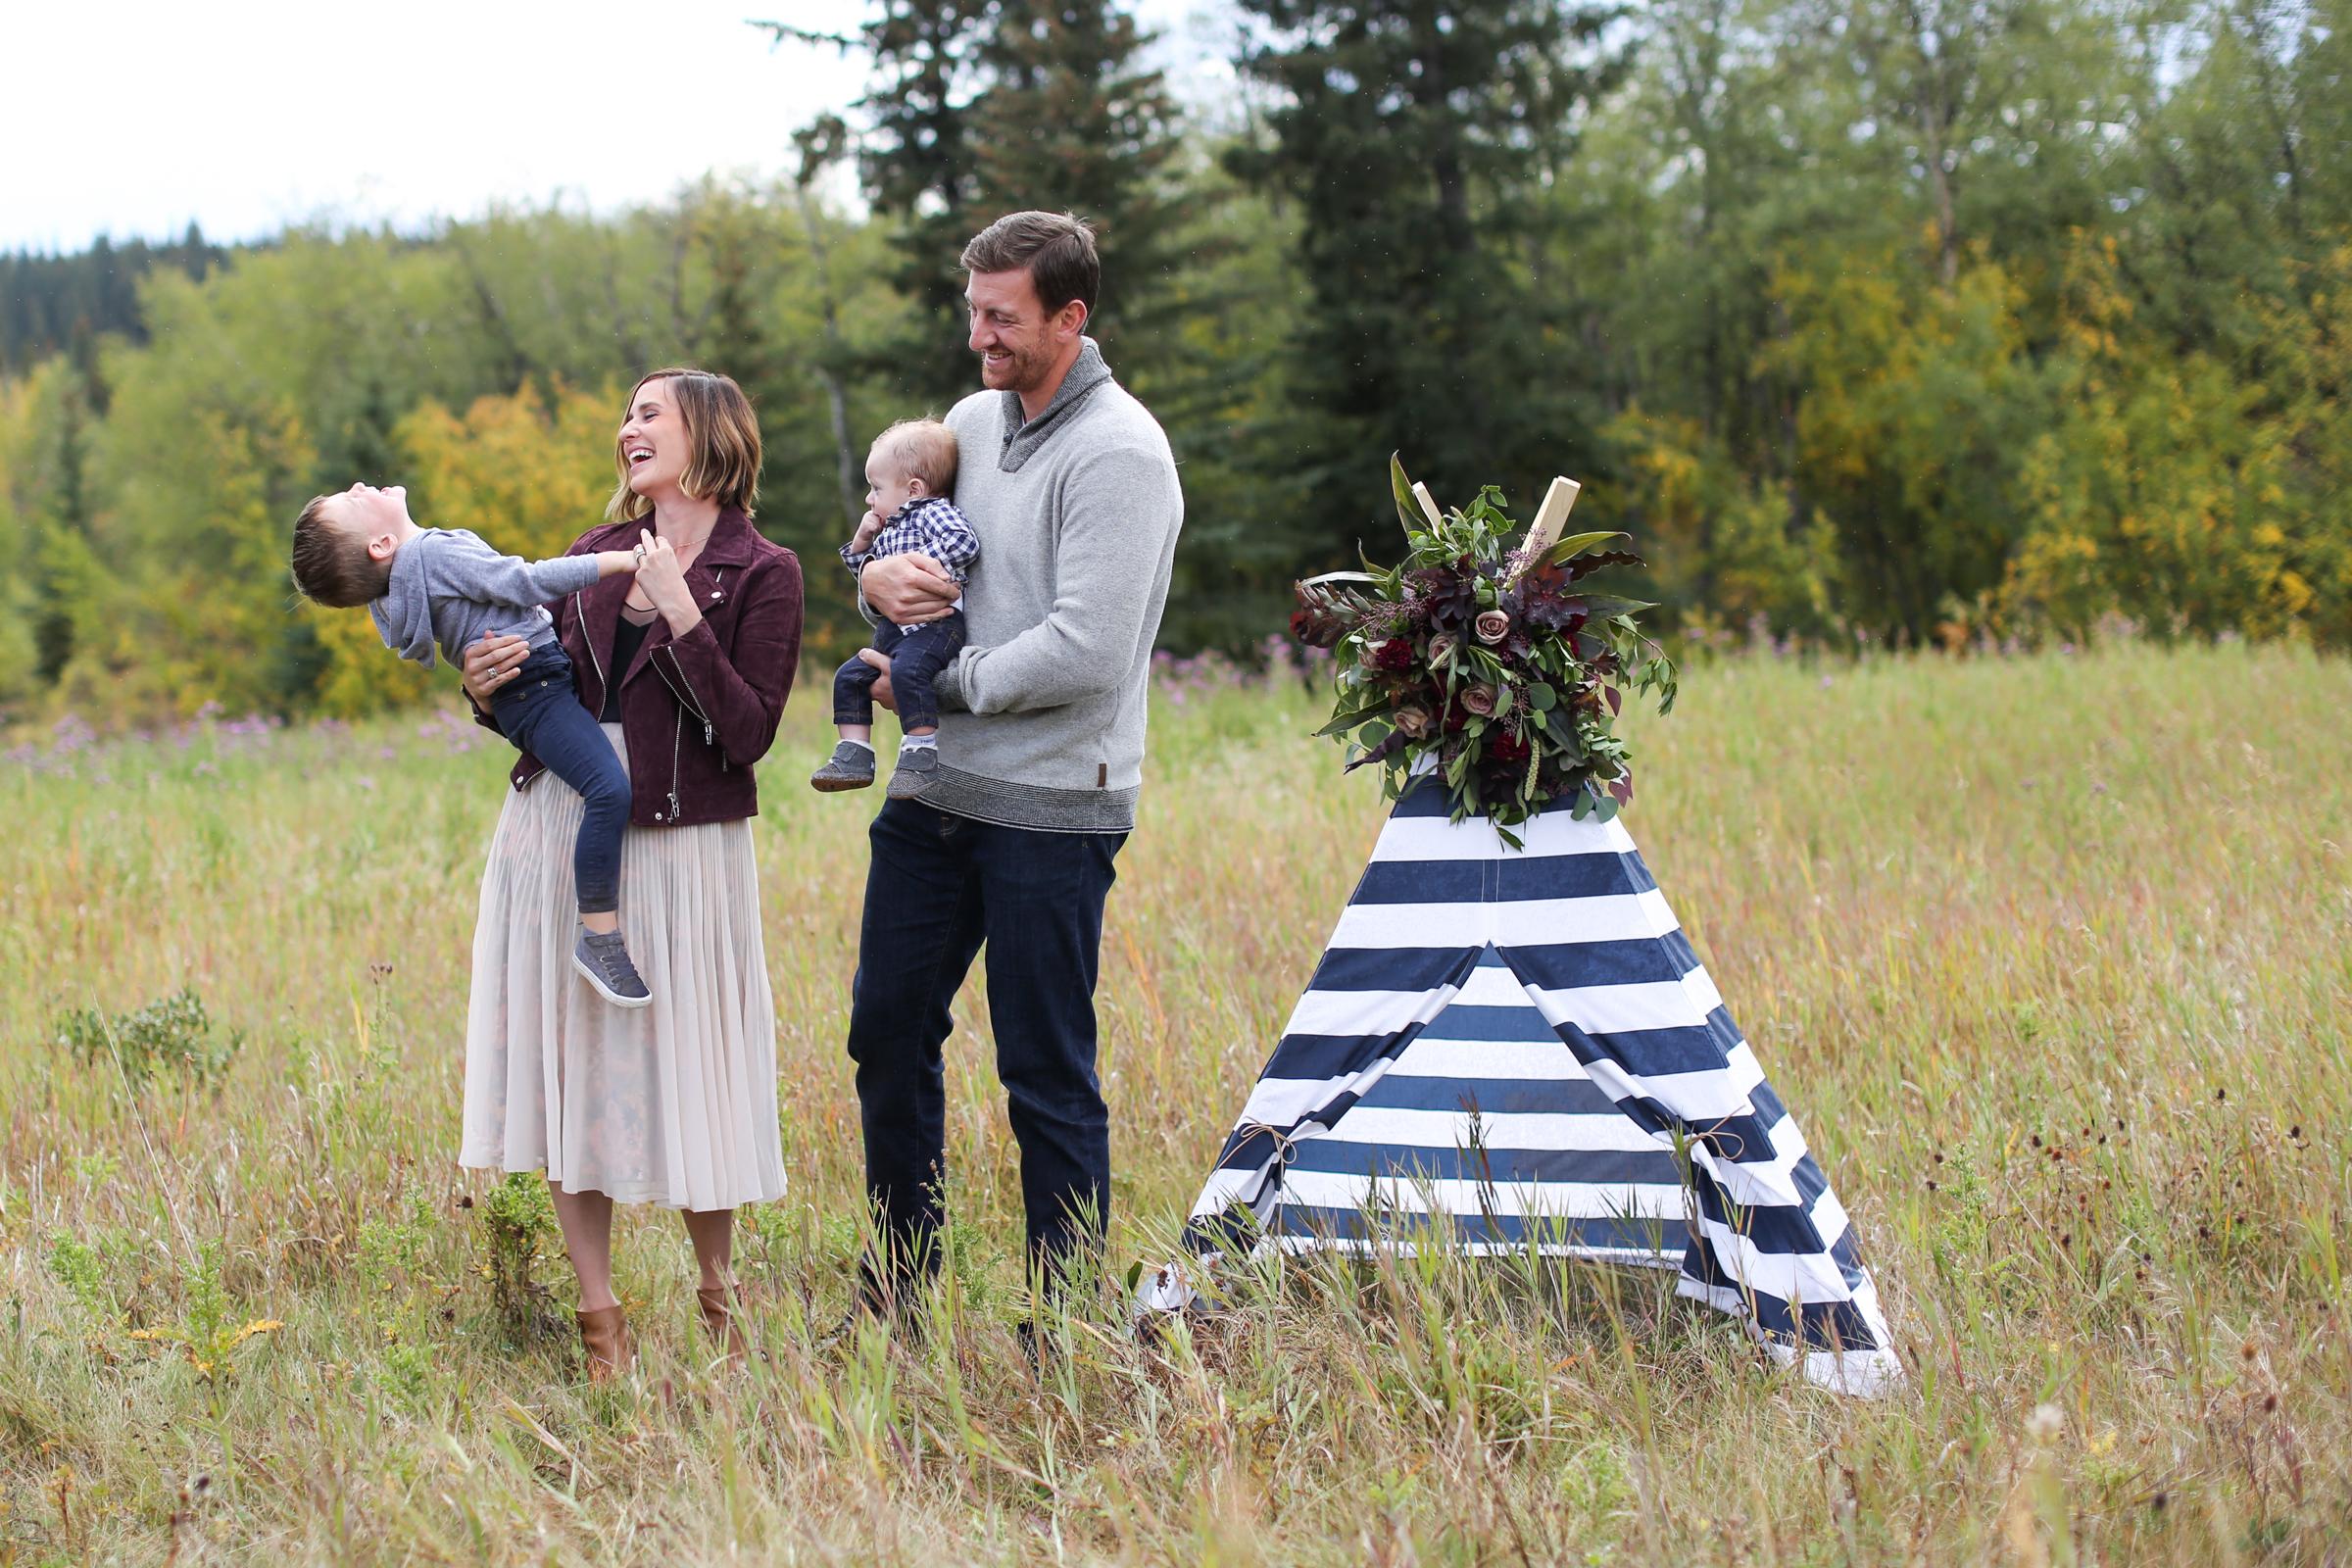 Fall-Family-Creative-Lindsay_Skeans_Photography-9.jpg